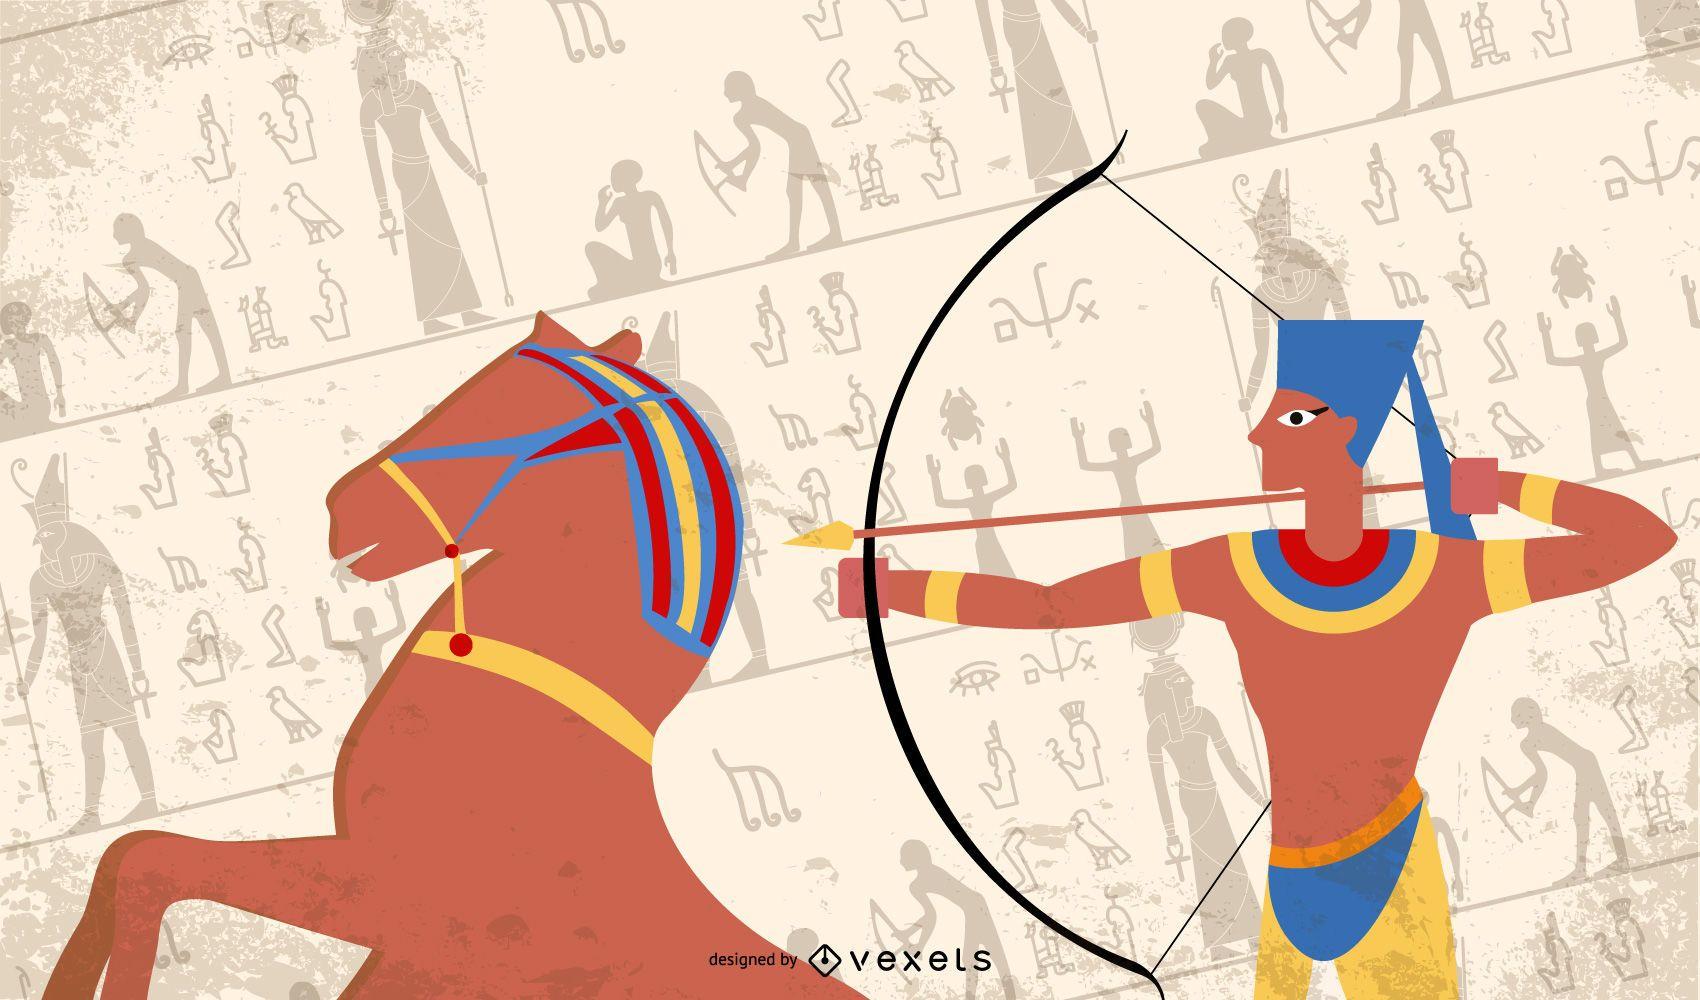 Ramesses II in the Battle of Kadesh